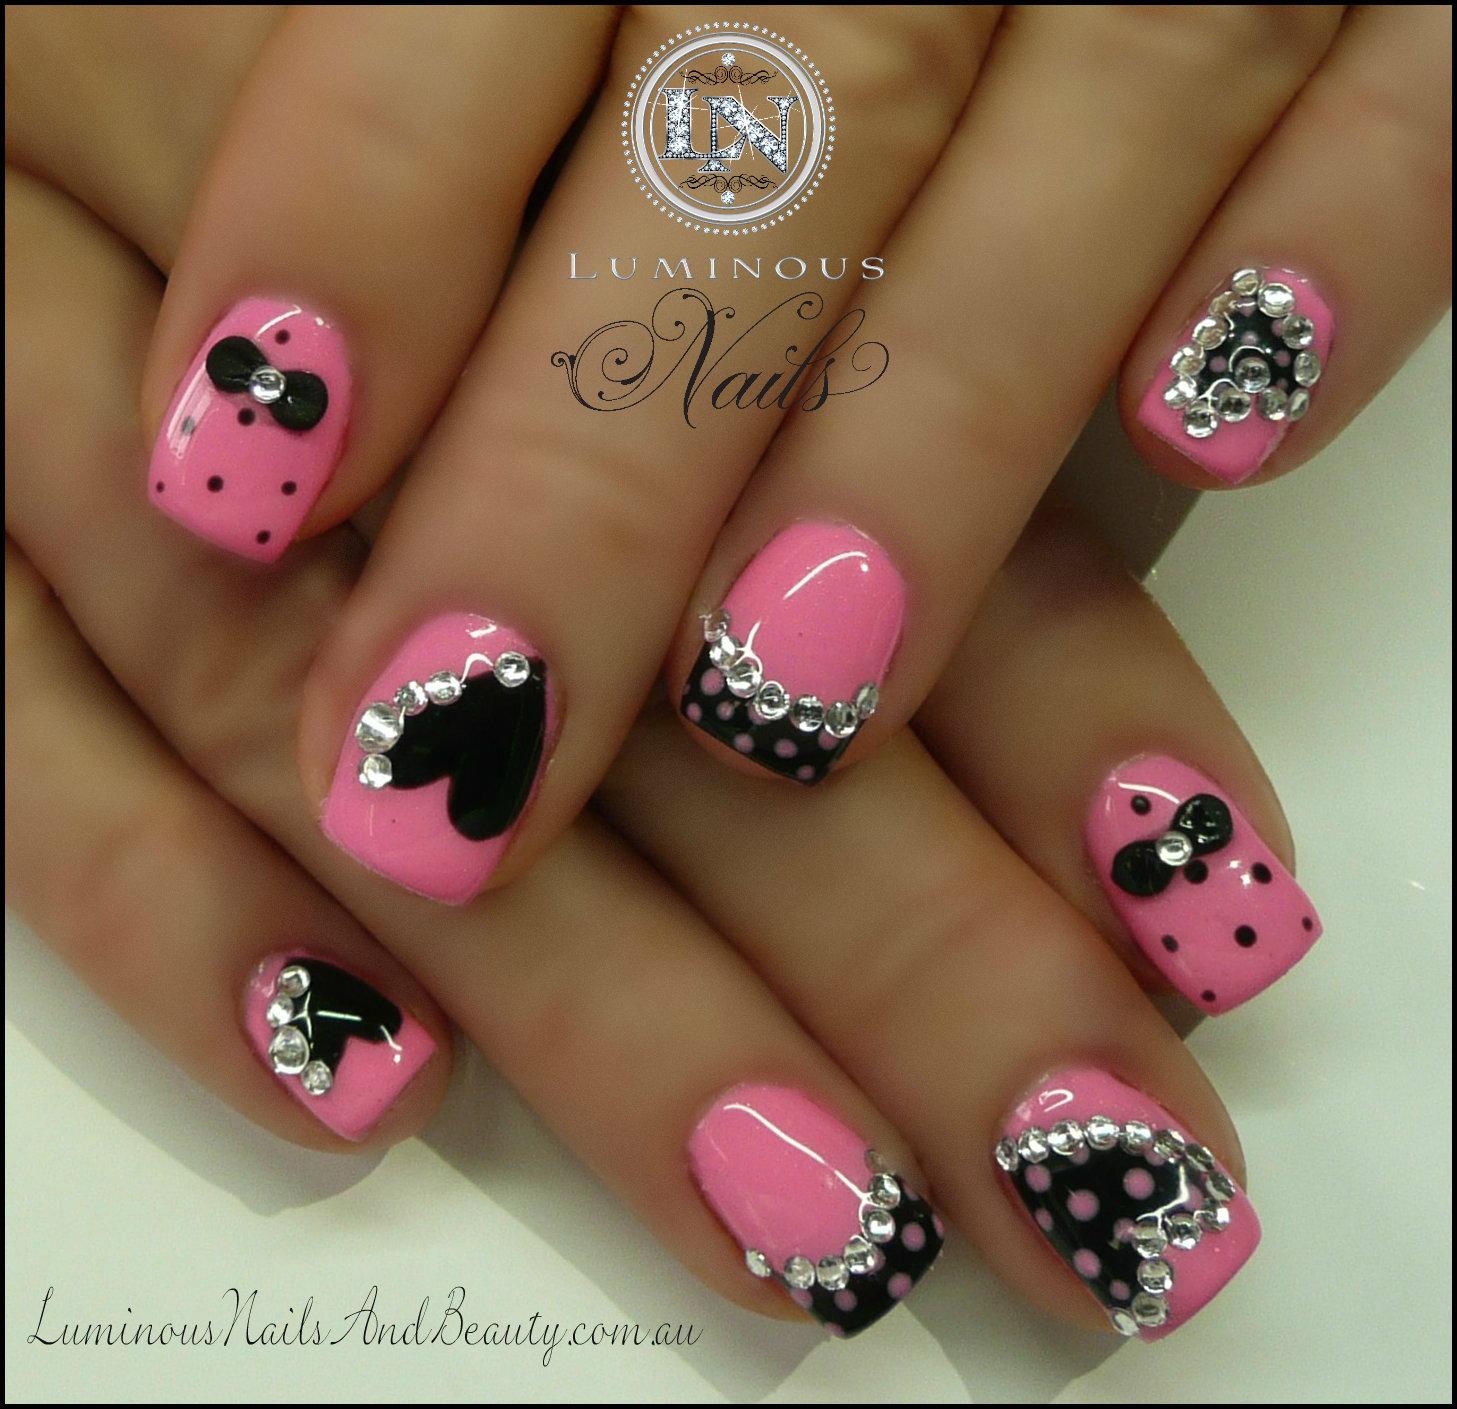 Nails gel nails sculptured gel with custom pink gel mani q black